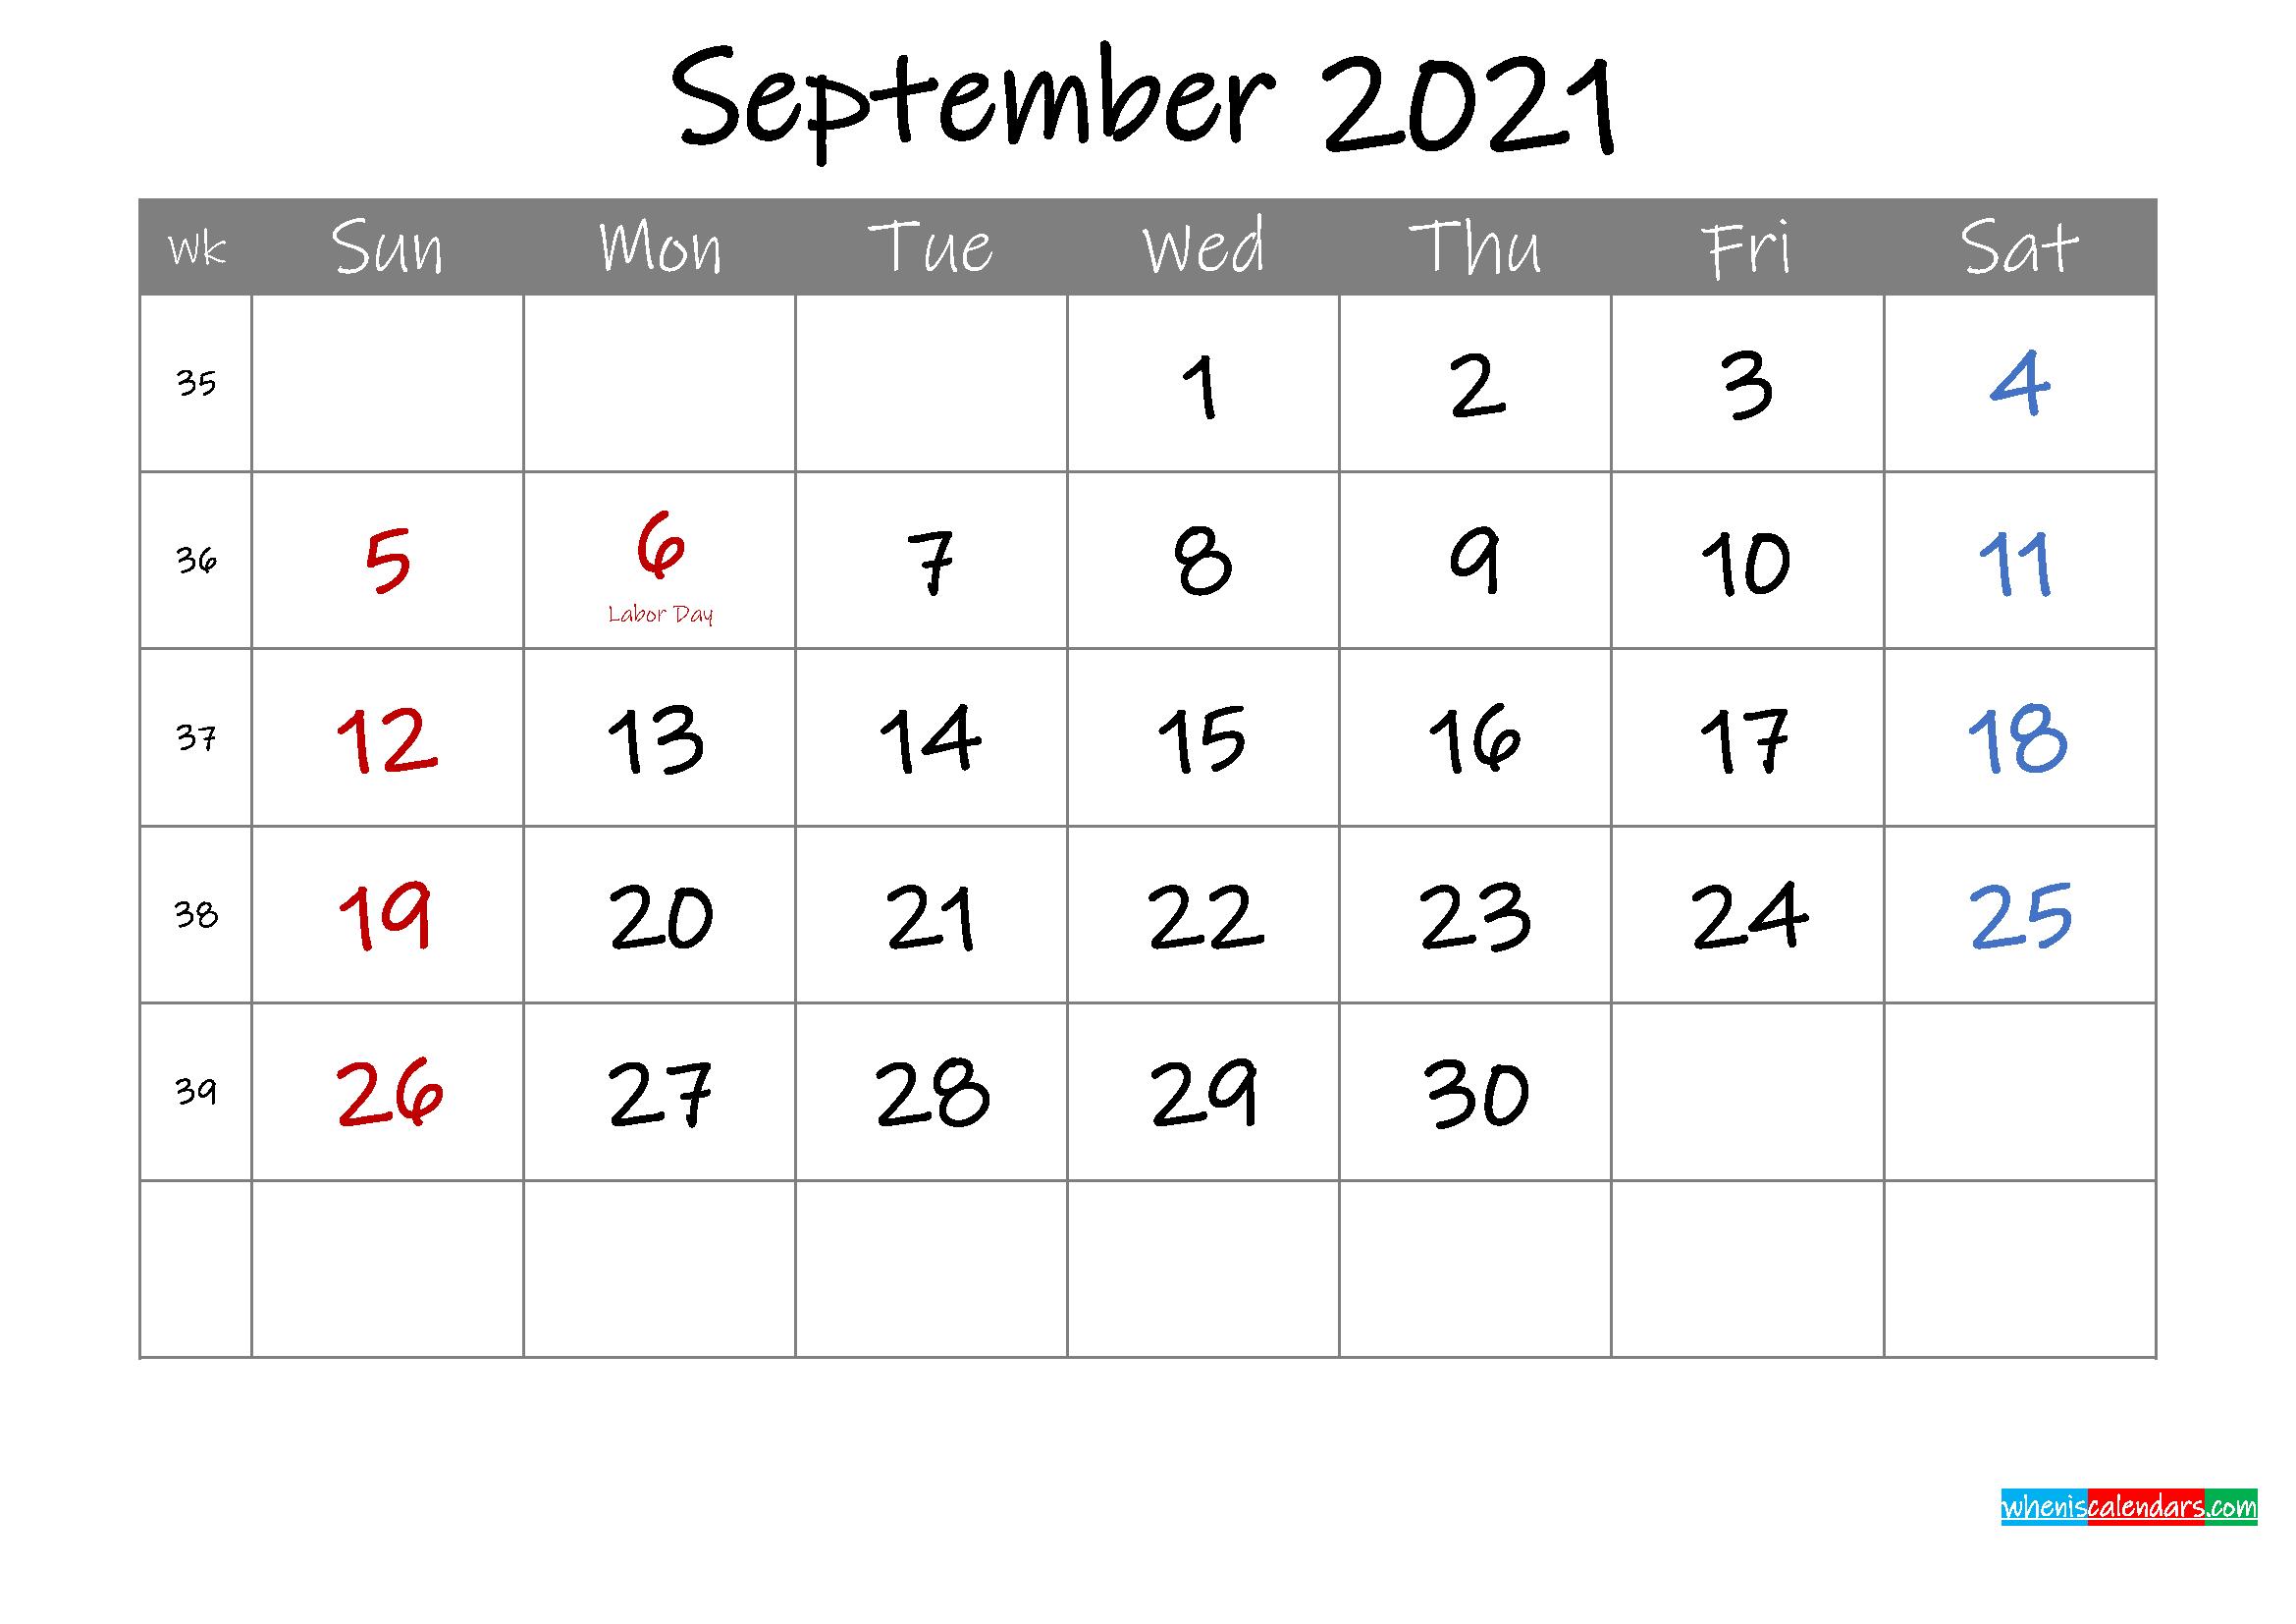 Editable September 2021 Calendar With Holidays Template